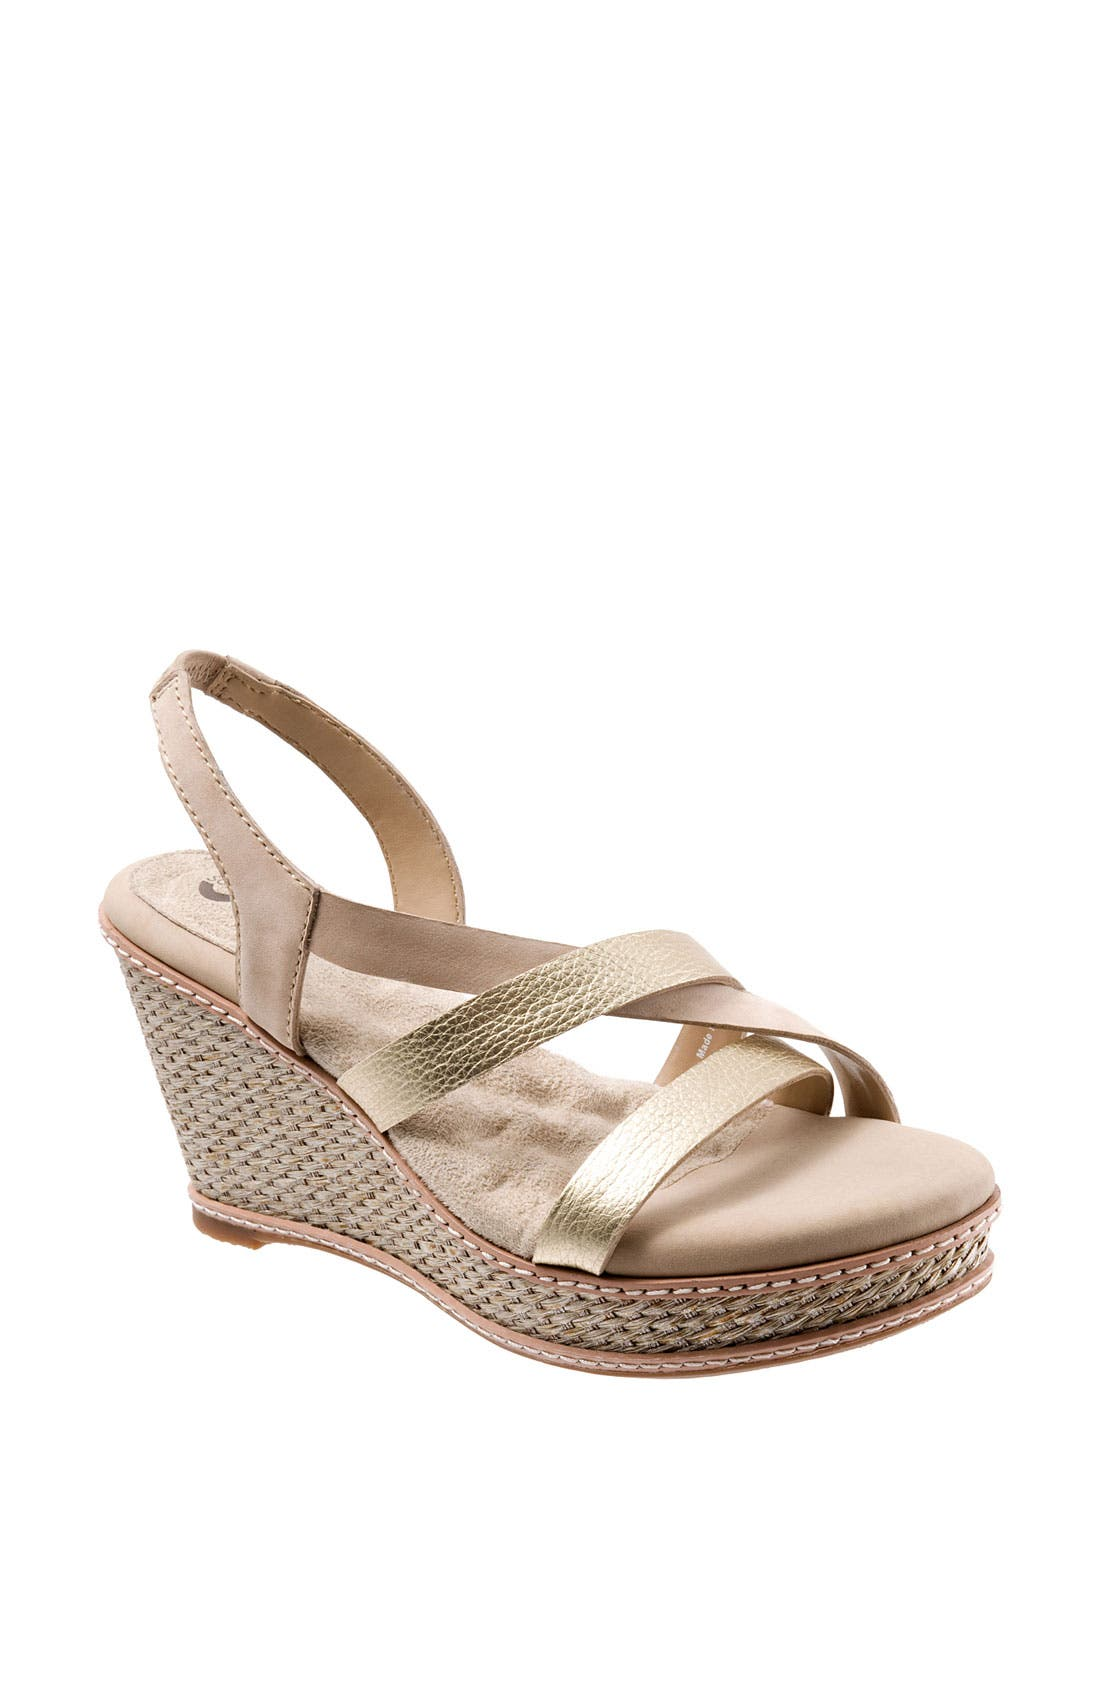 Main Image - SoftWalk® 'San Pablo' Sandal